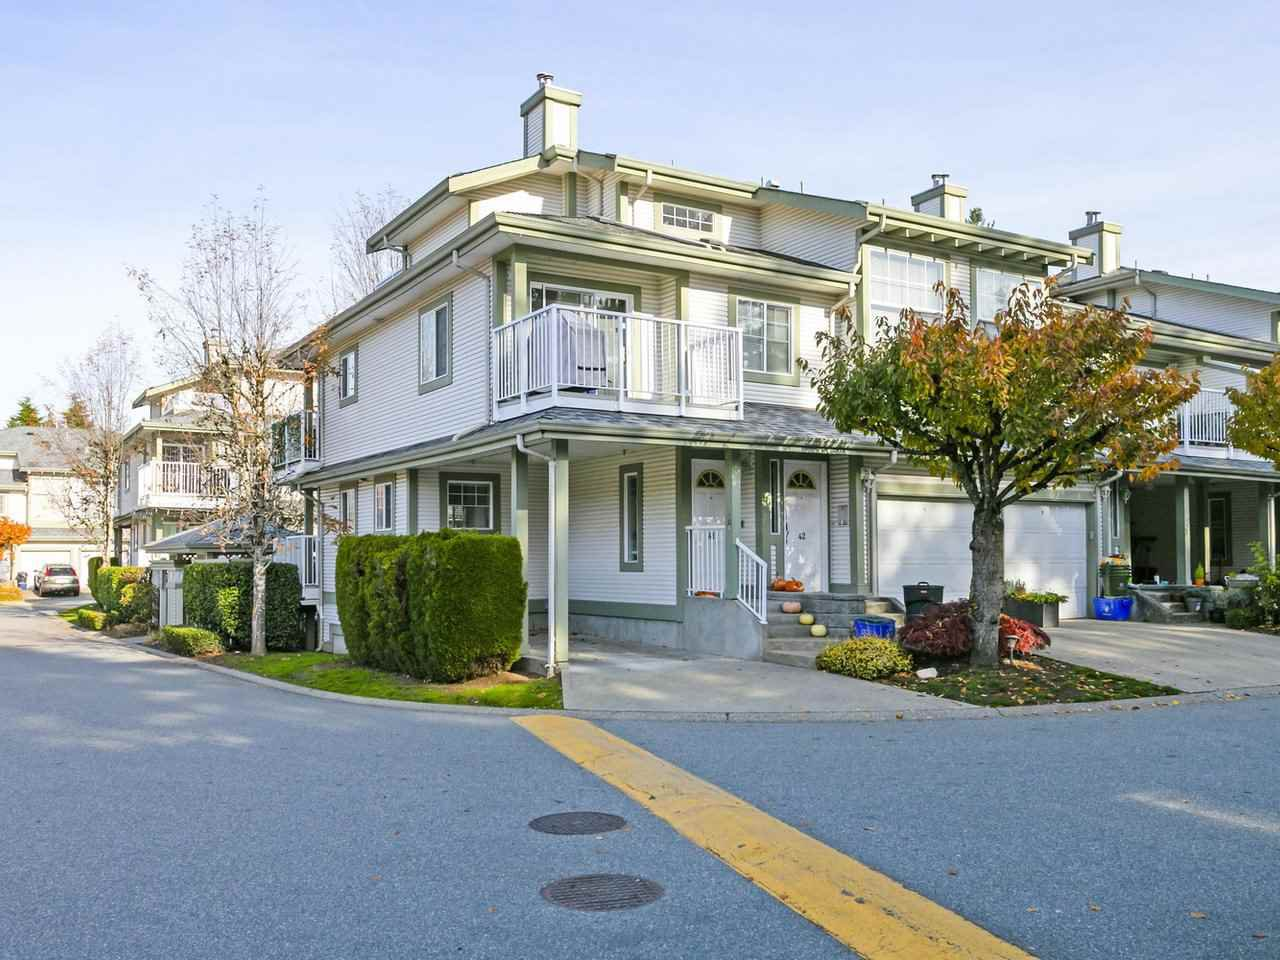 "Main Photo: 41 8892 208 Street in Langley: Walnut Grove Townhouse for sale in ""HUNTER'S RUN"" : MLS®# R2417904"